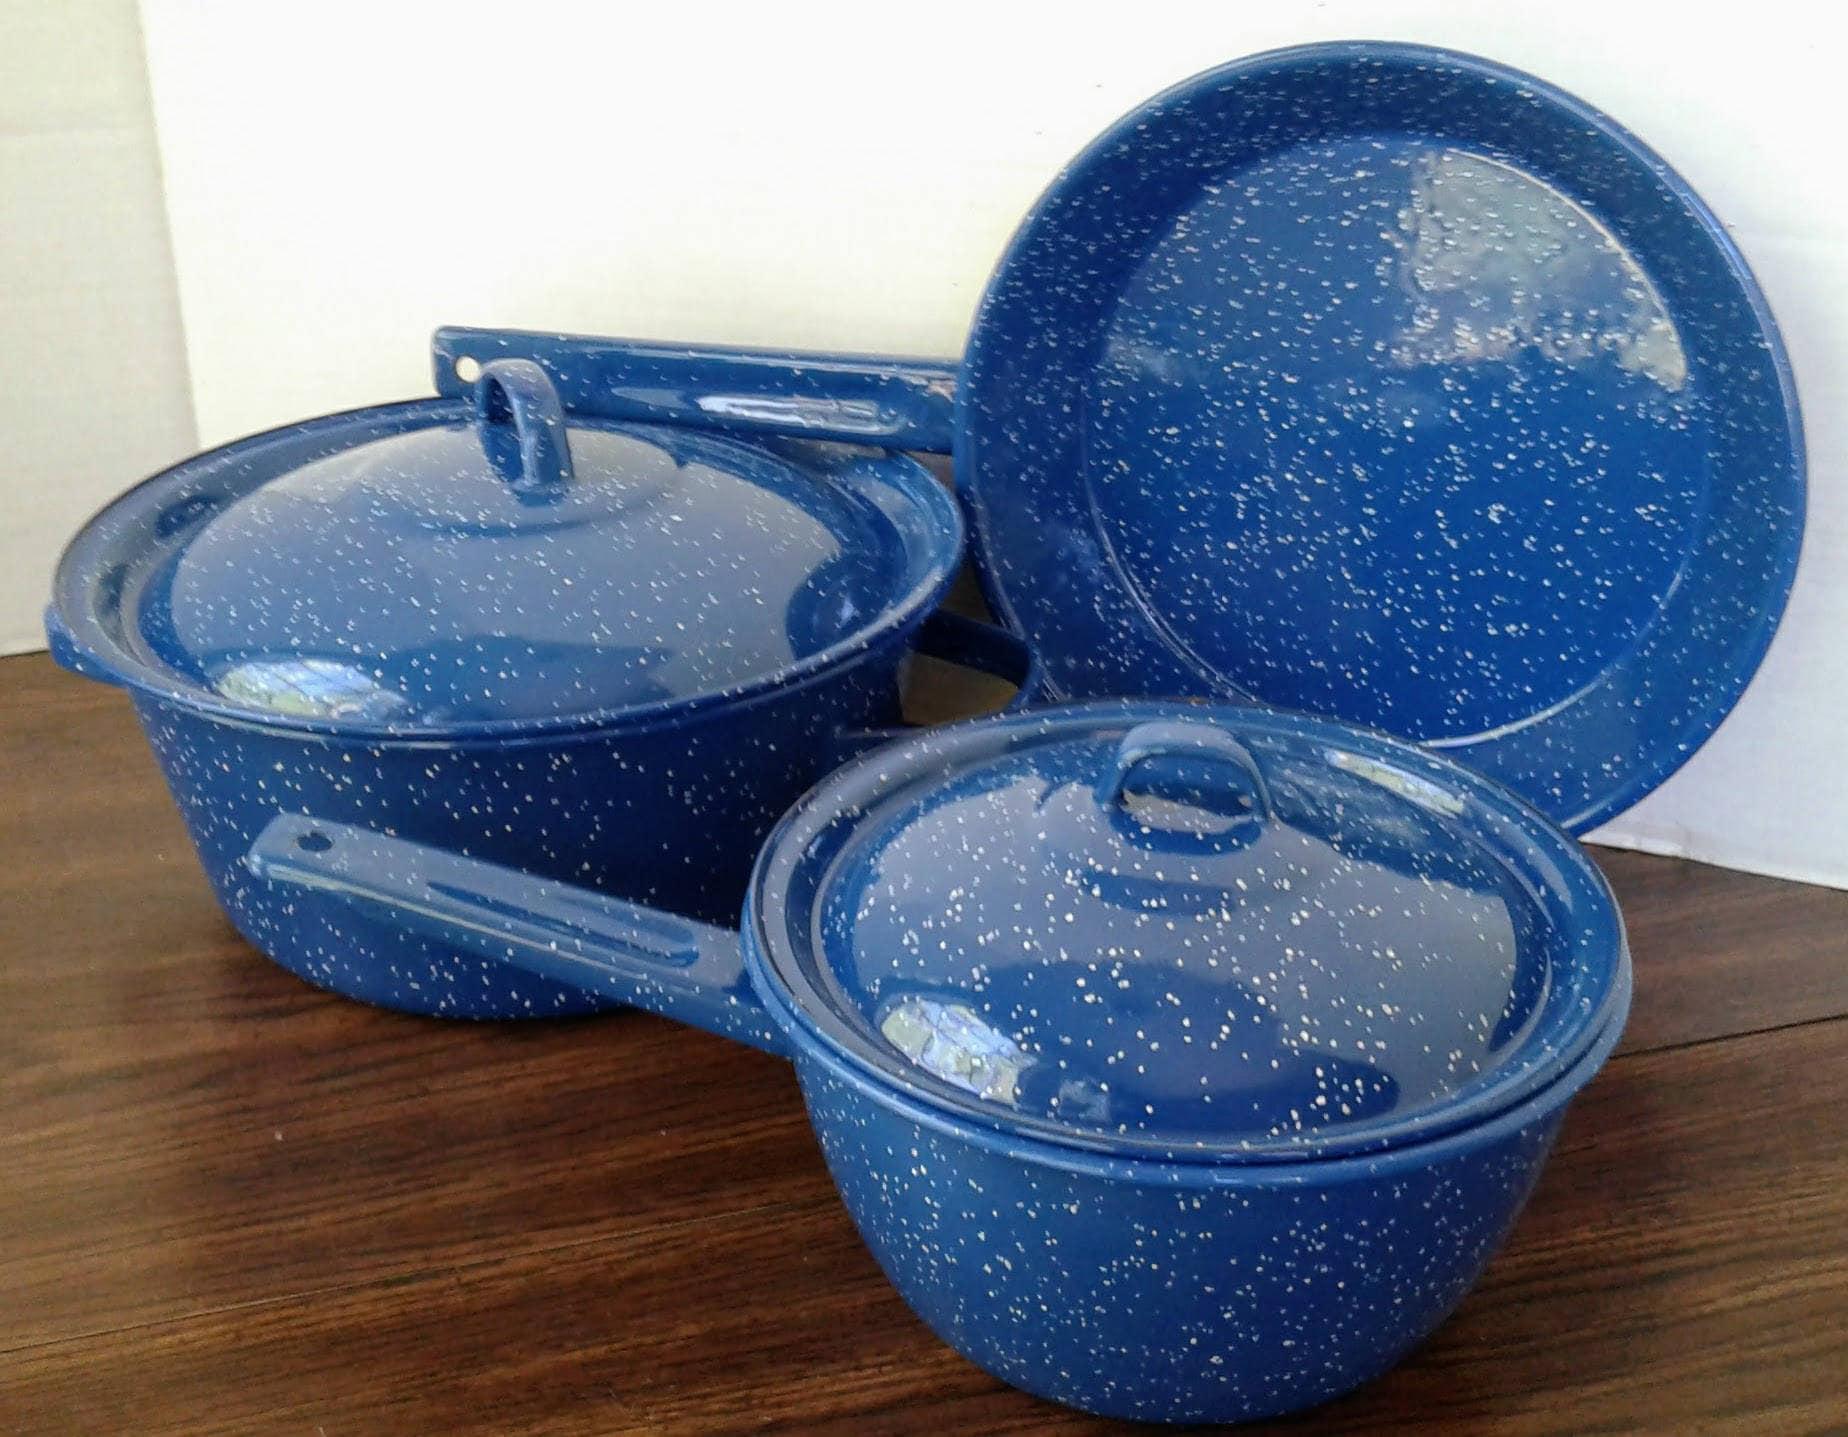 Blue Enamel Pots And Pans Enamelware Graniteware Camping Gear